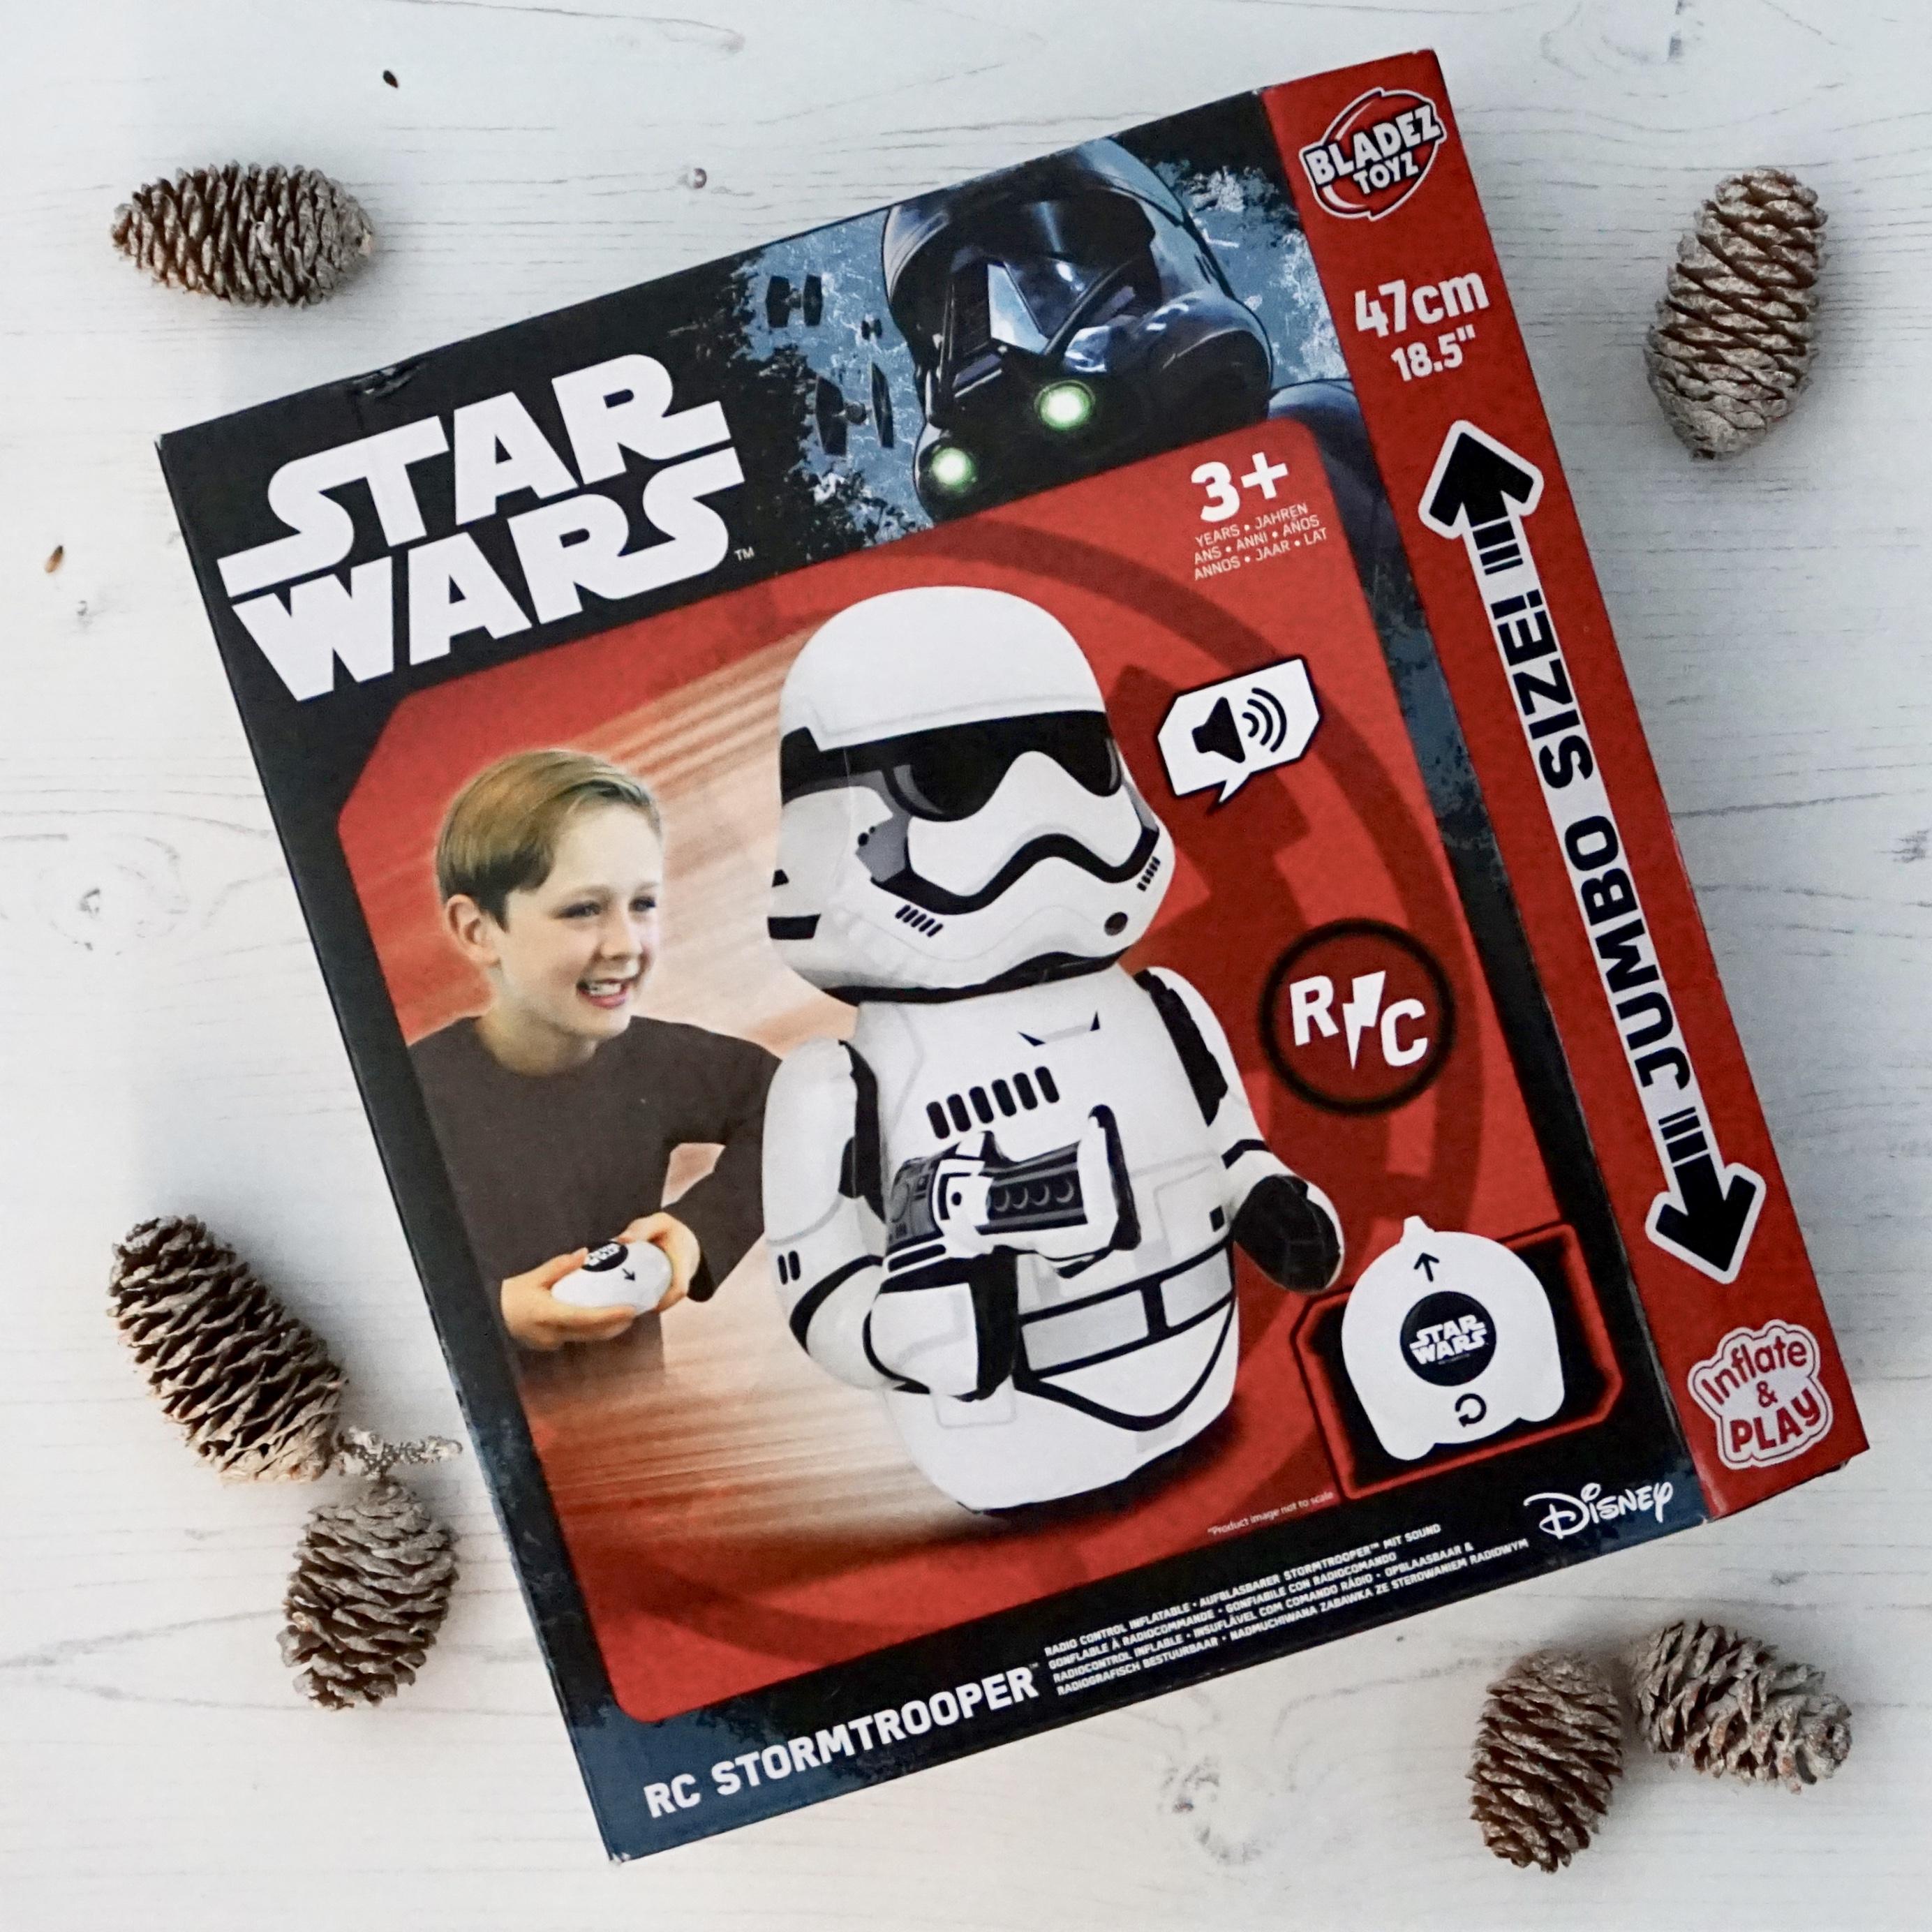 Christmas gifts Star Wars rc